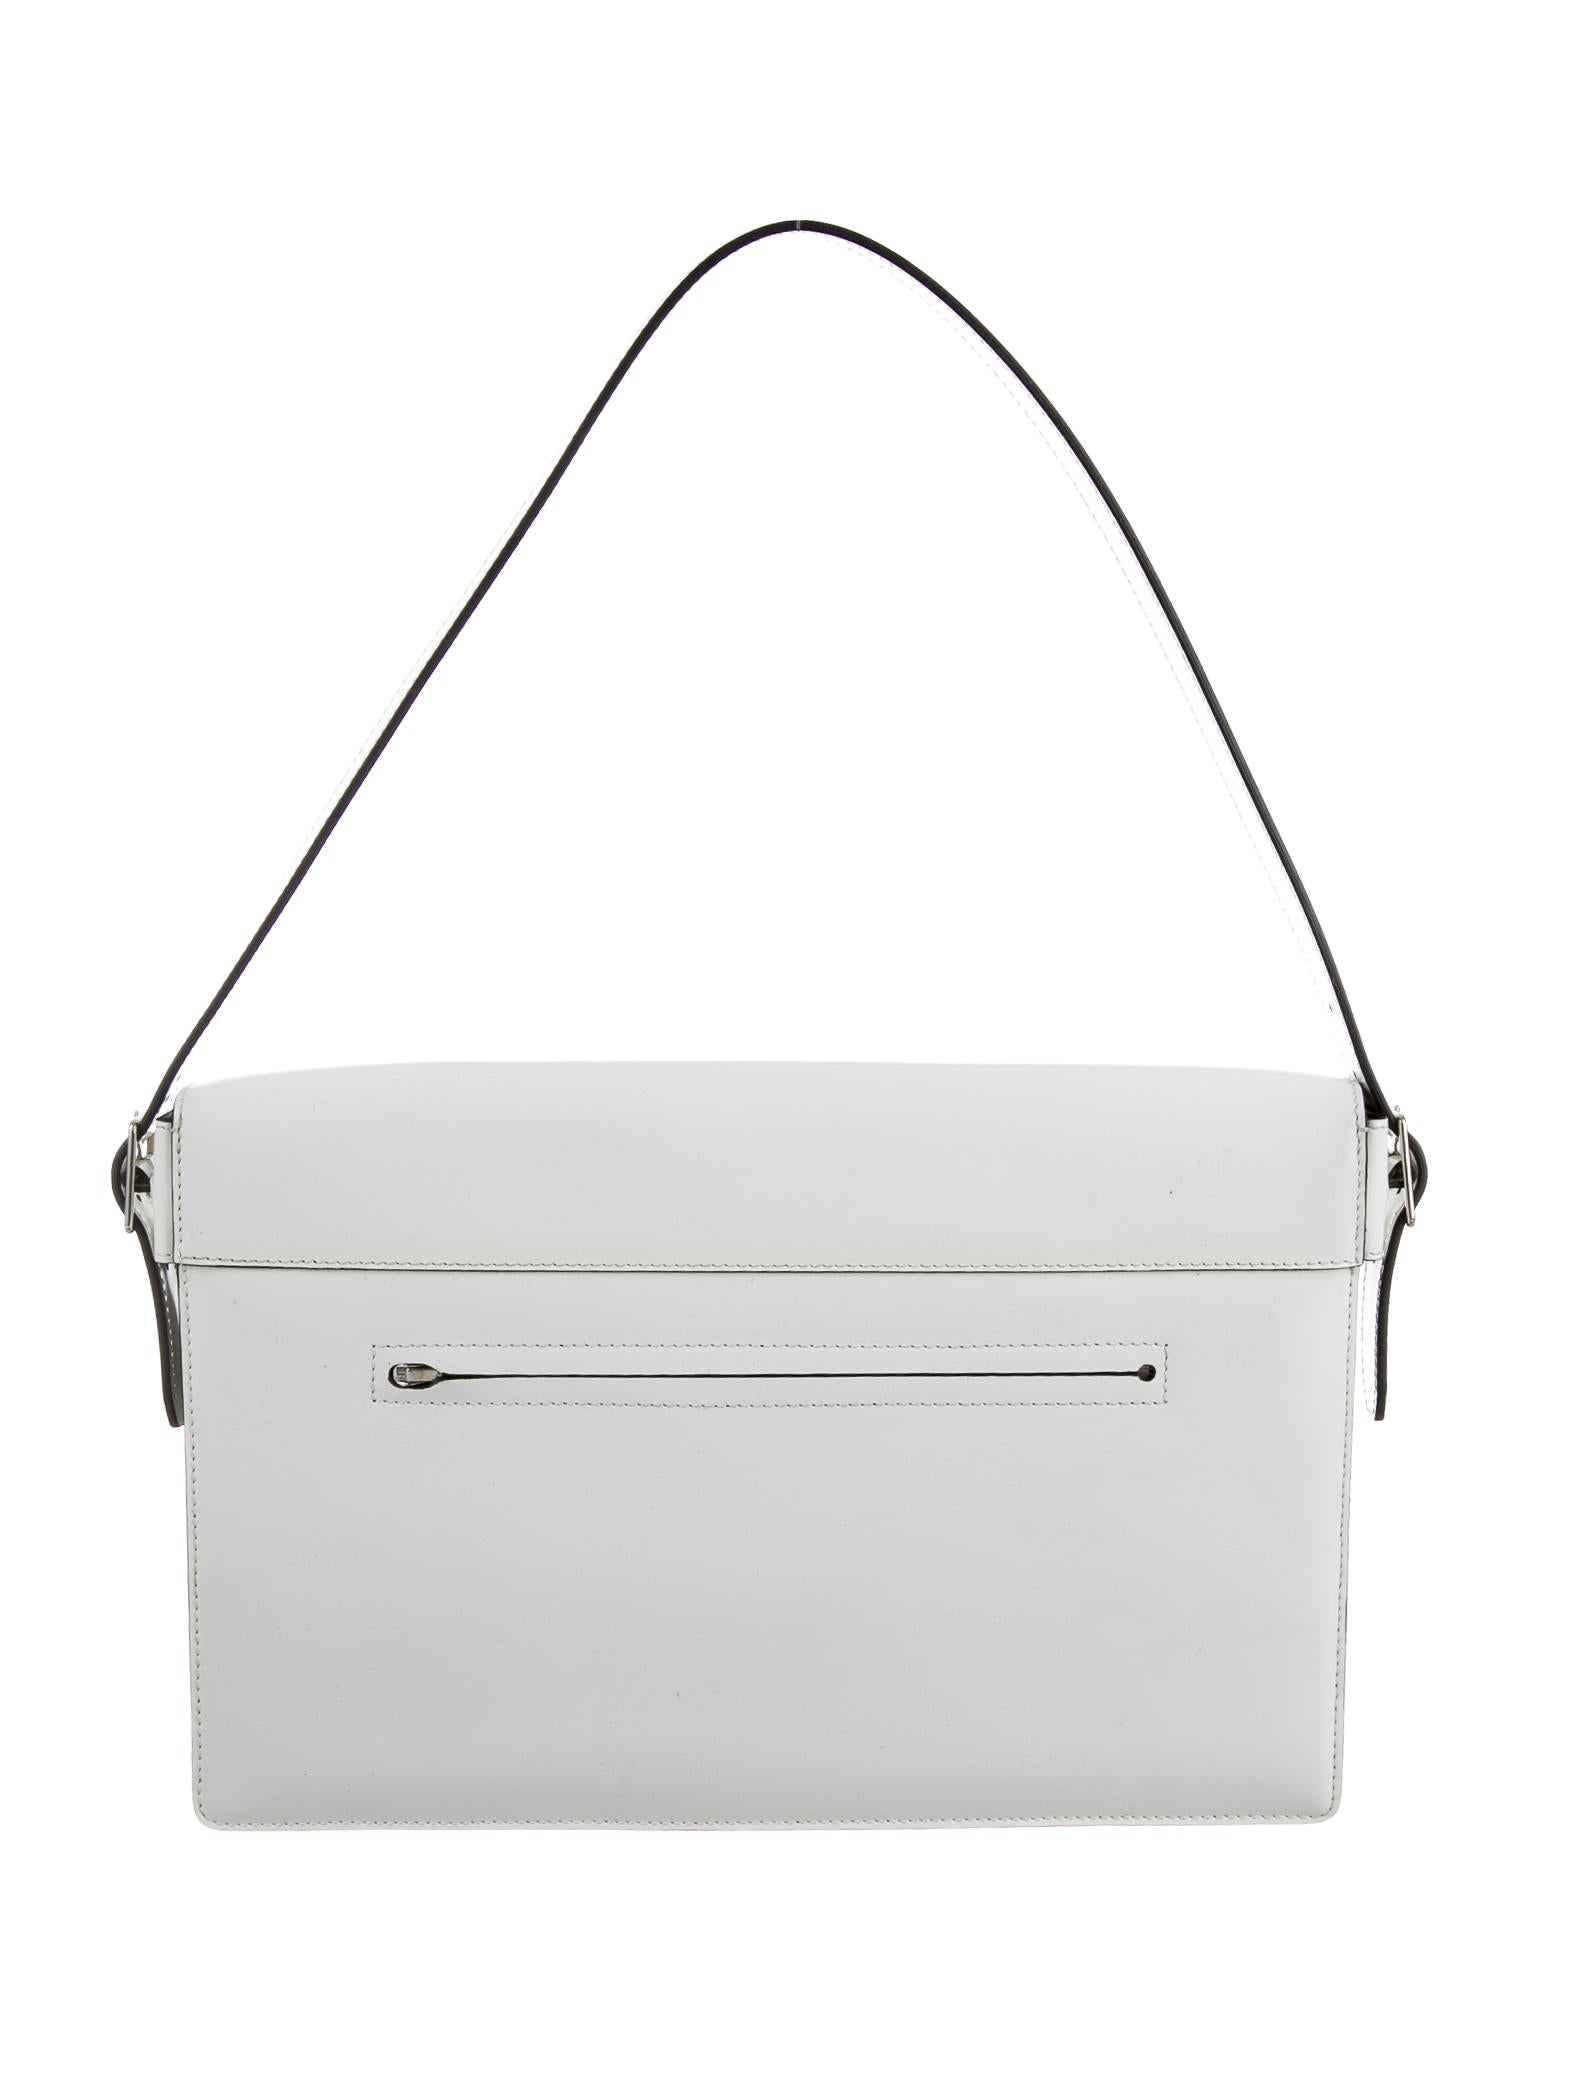 C��line Diamond Shoulder Bag - Handbags - CEL27148 | The RealReal